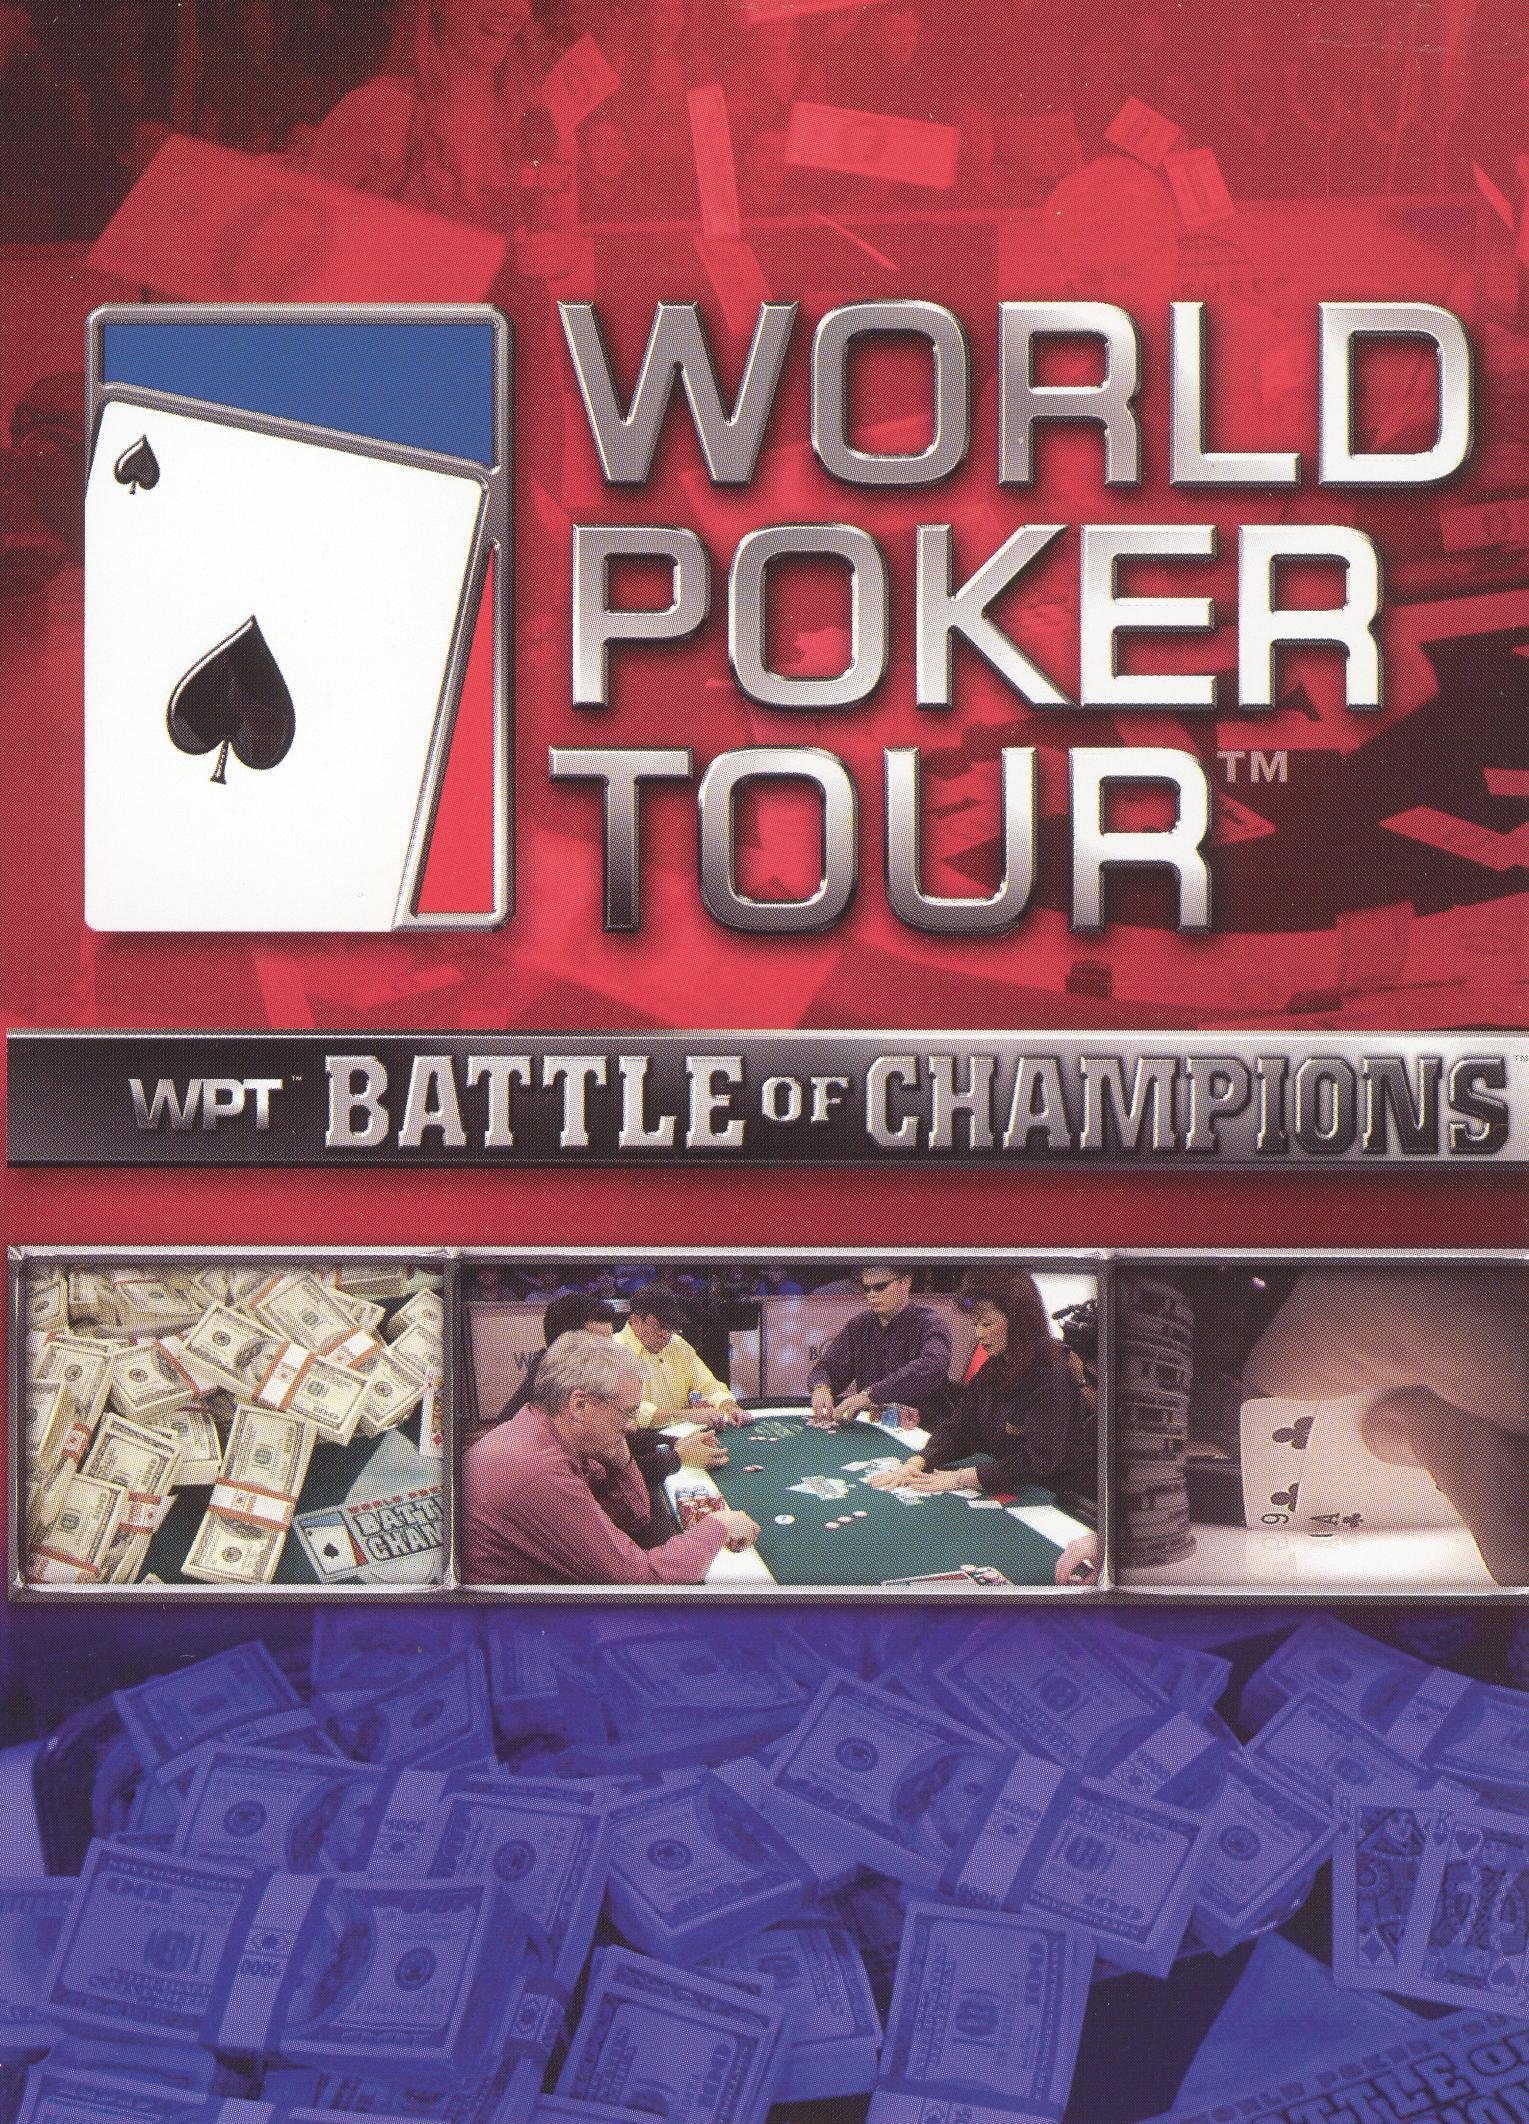 World Poker Tour: WPT Battle of Champions